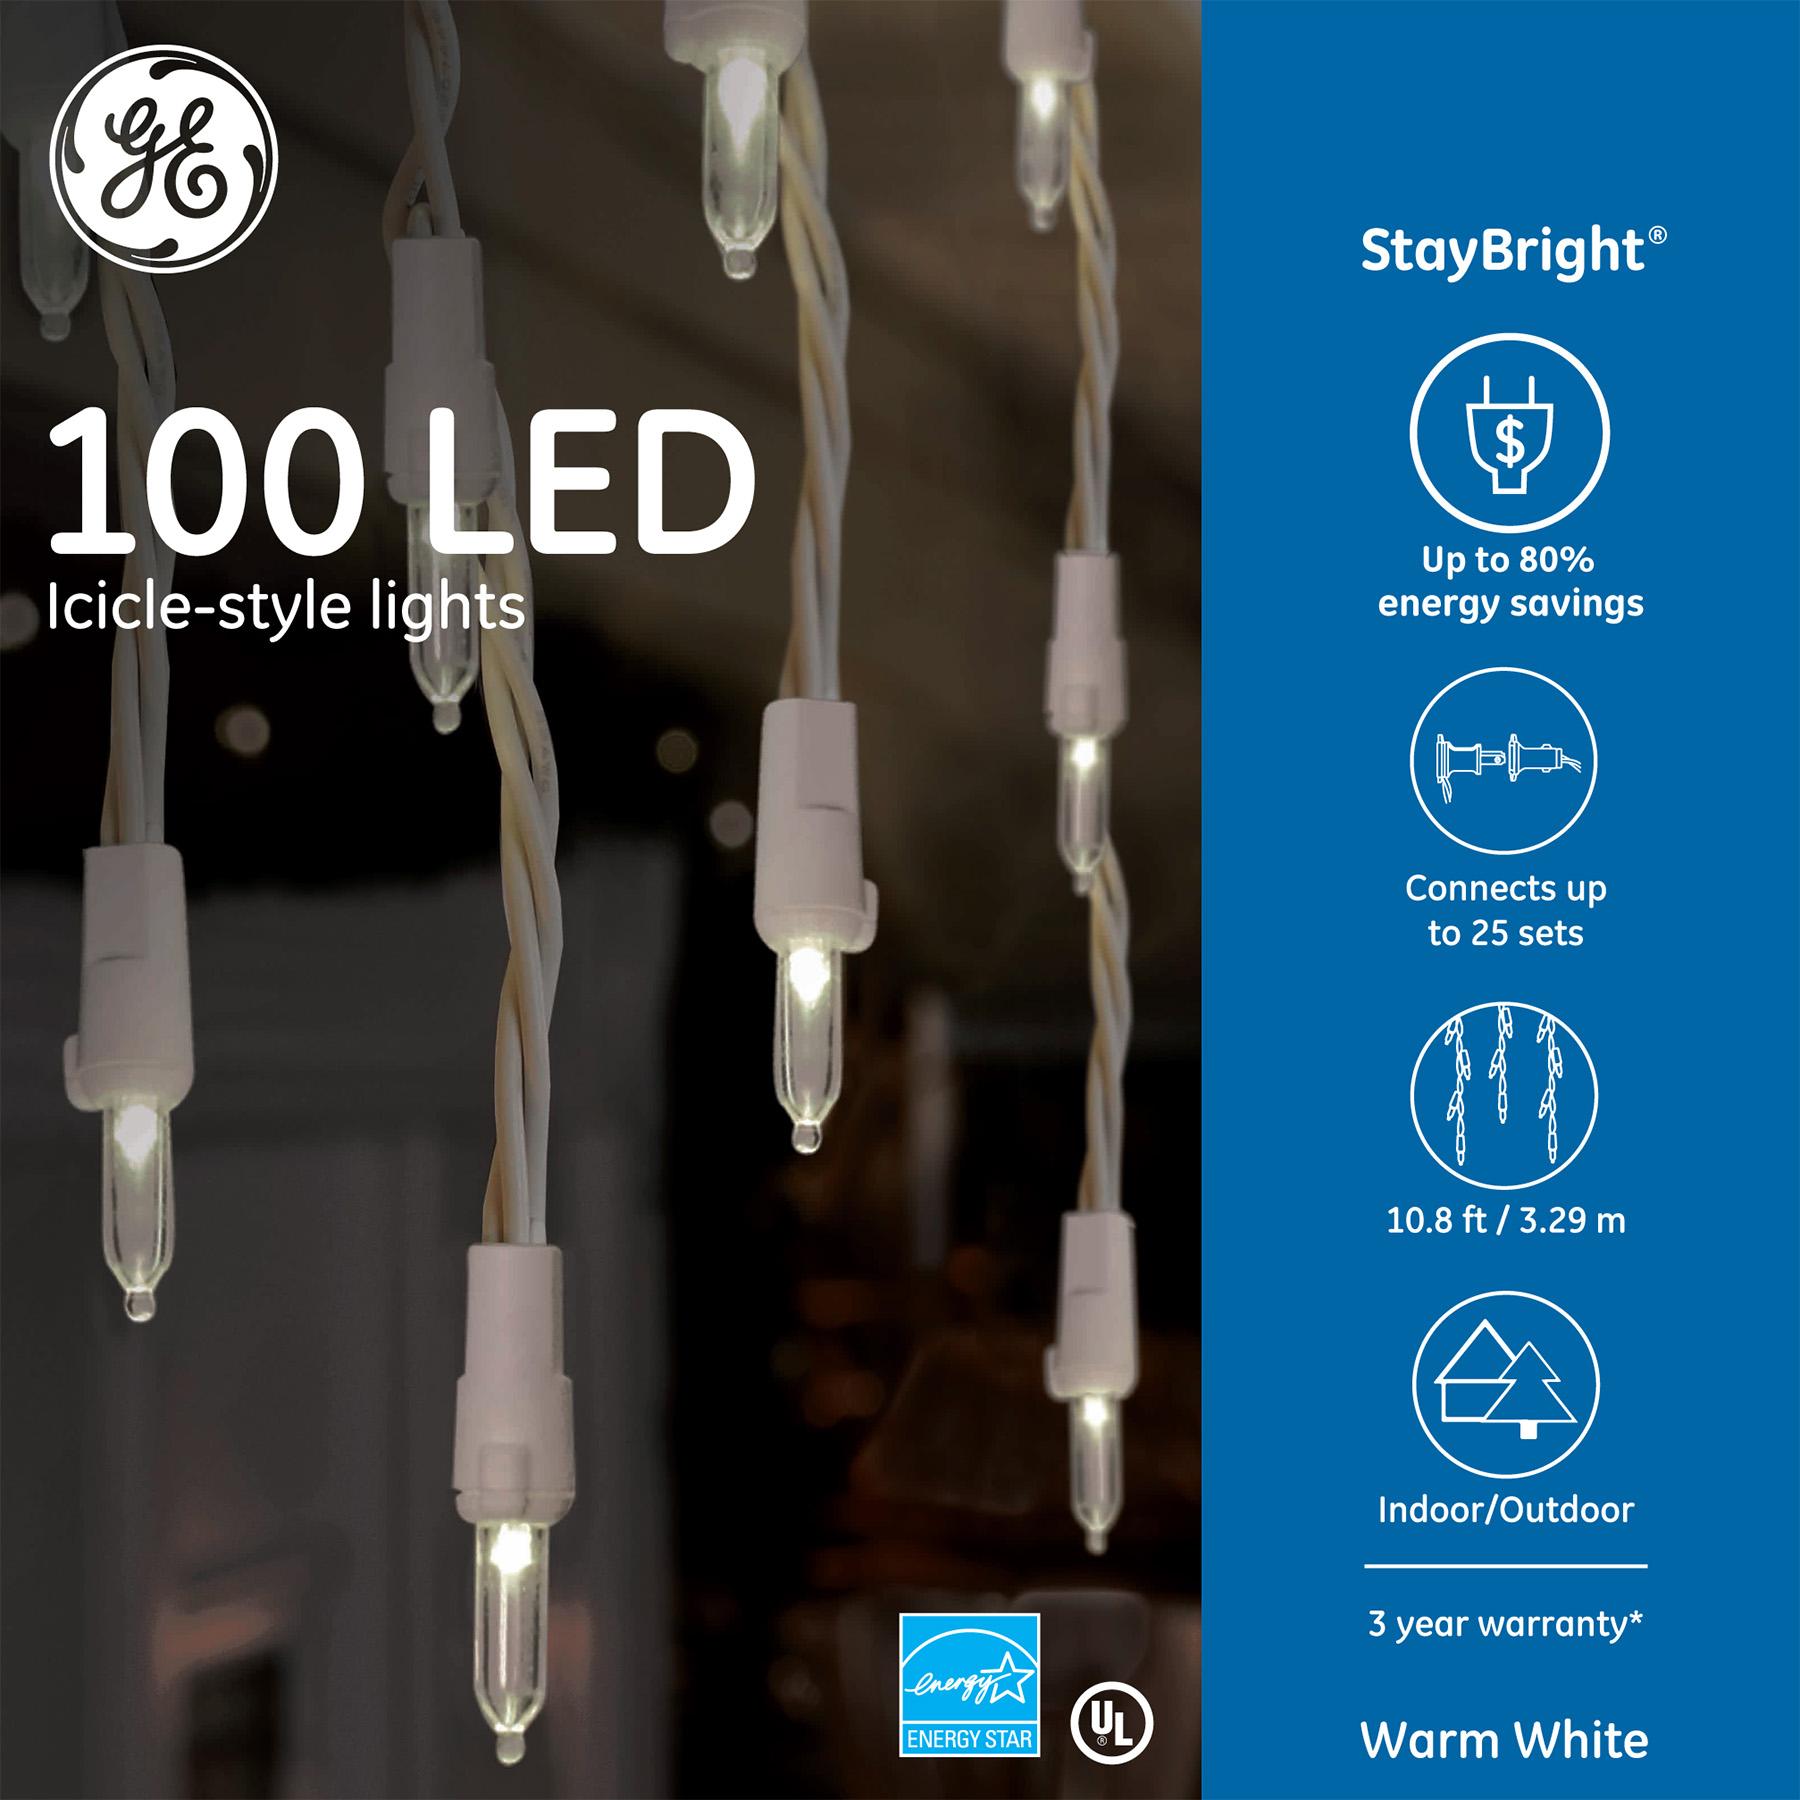 90866 - GE StayBright® LED Icicle-Style Lights 100ct Warm White & 90866 - GE StayBright® LED Icicle-Style Lights 100ct Warm White ...